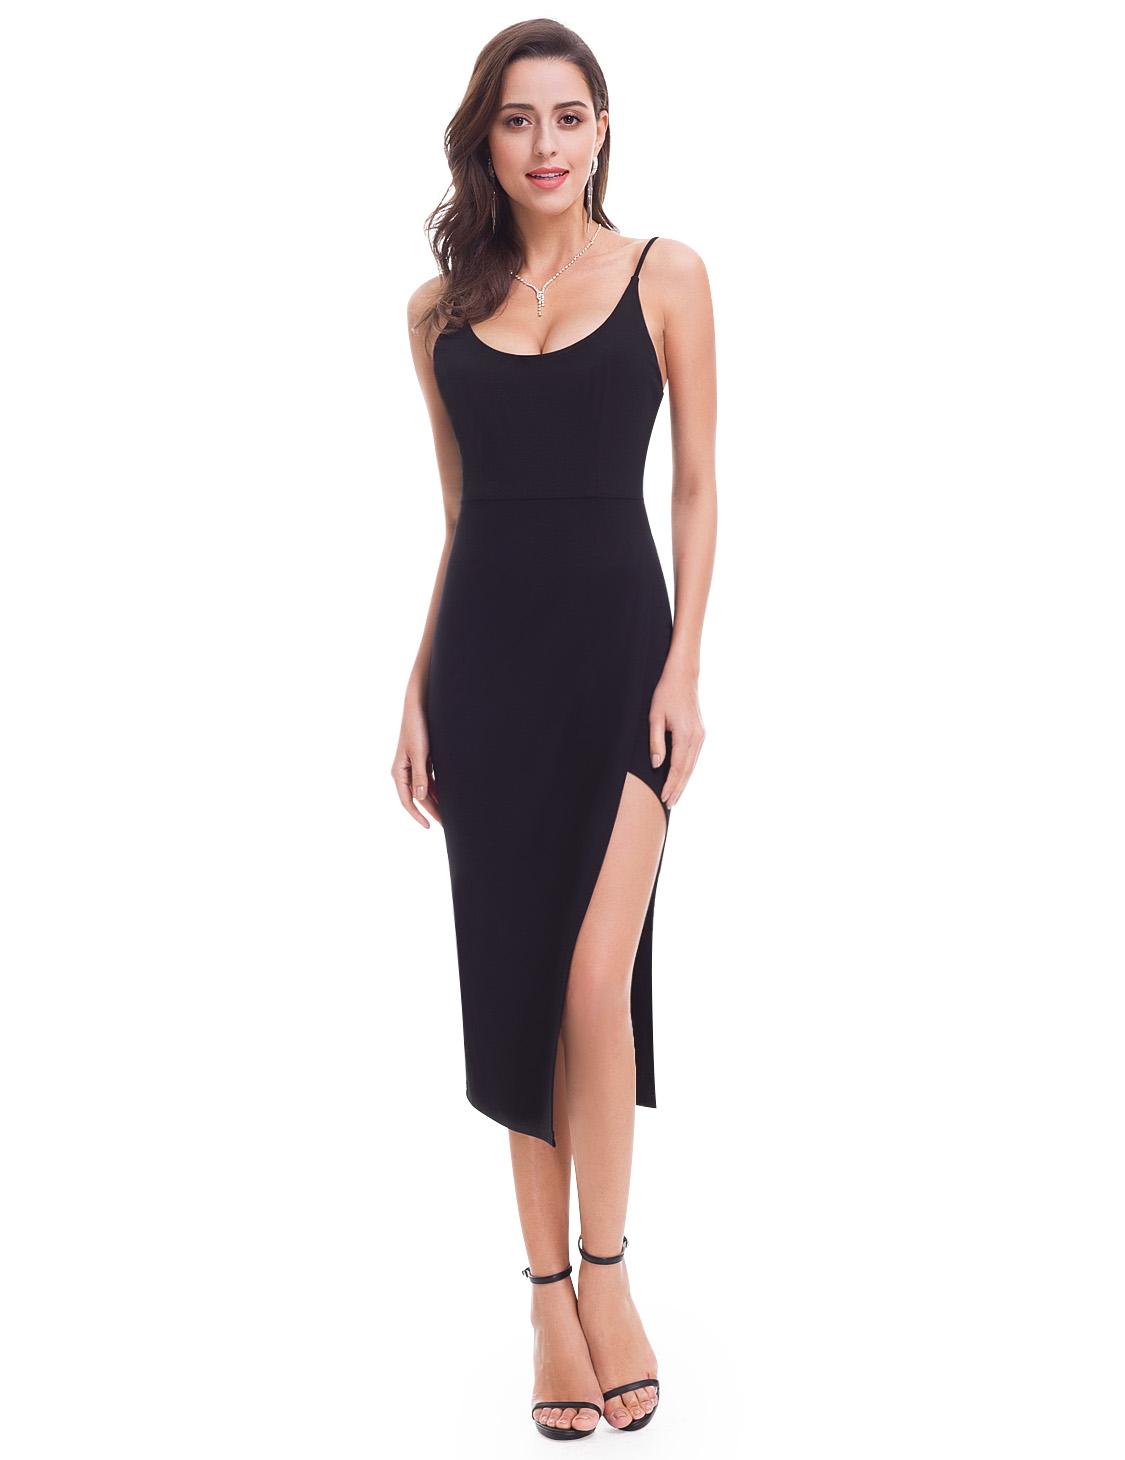 Ever-Pretty-Short-Black-Split-Bodycon-Dresses-Cocktail-Club-Party-Dress-07123